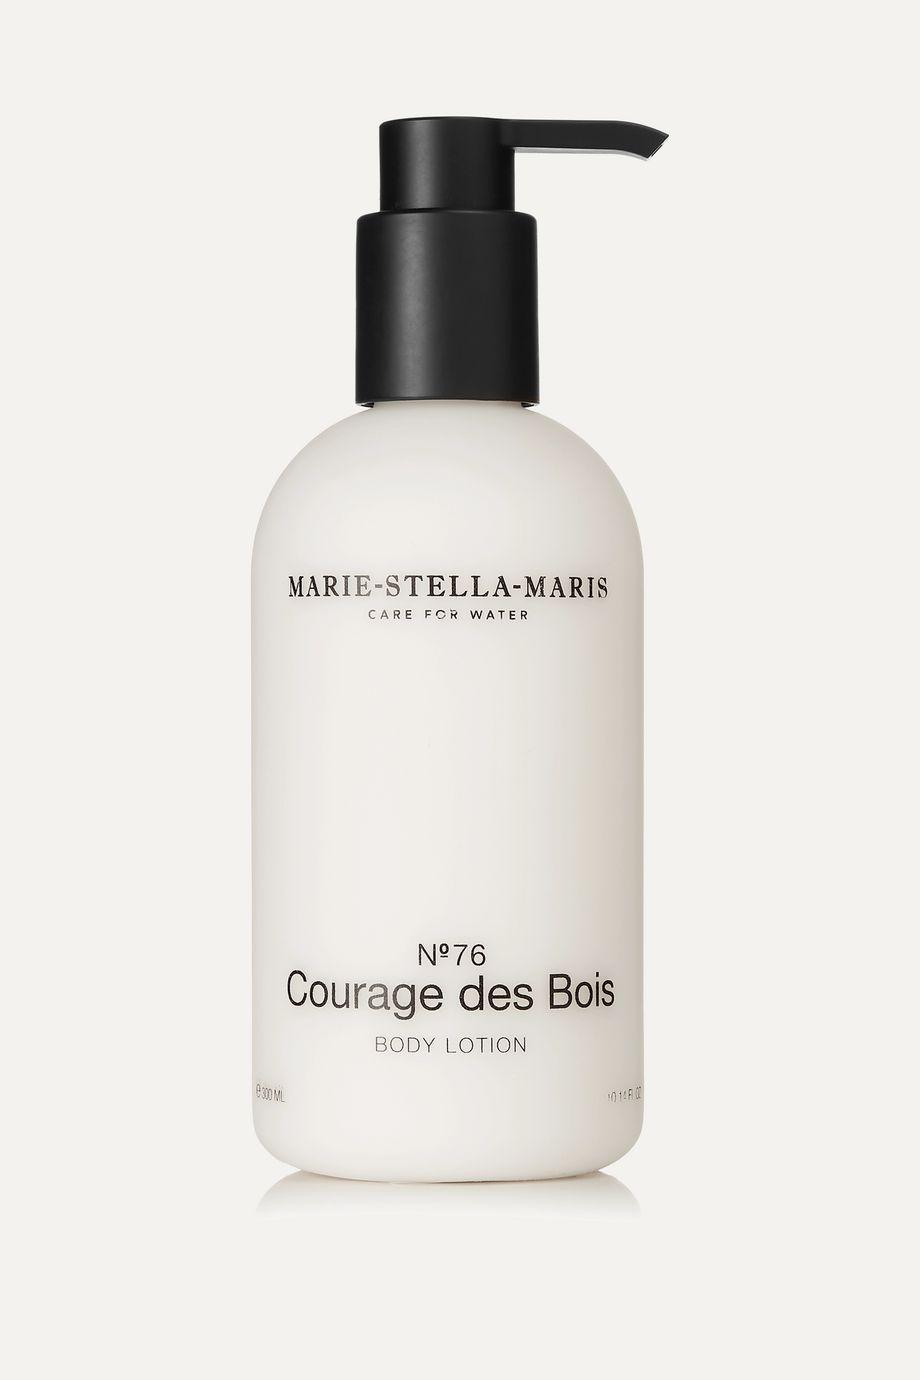 Marie-Stella-Maris No.76 Body Lotion – Courage des Bois, 300 ml – Bodylotion